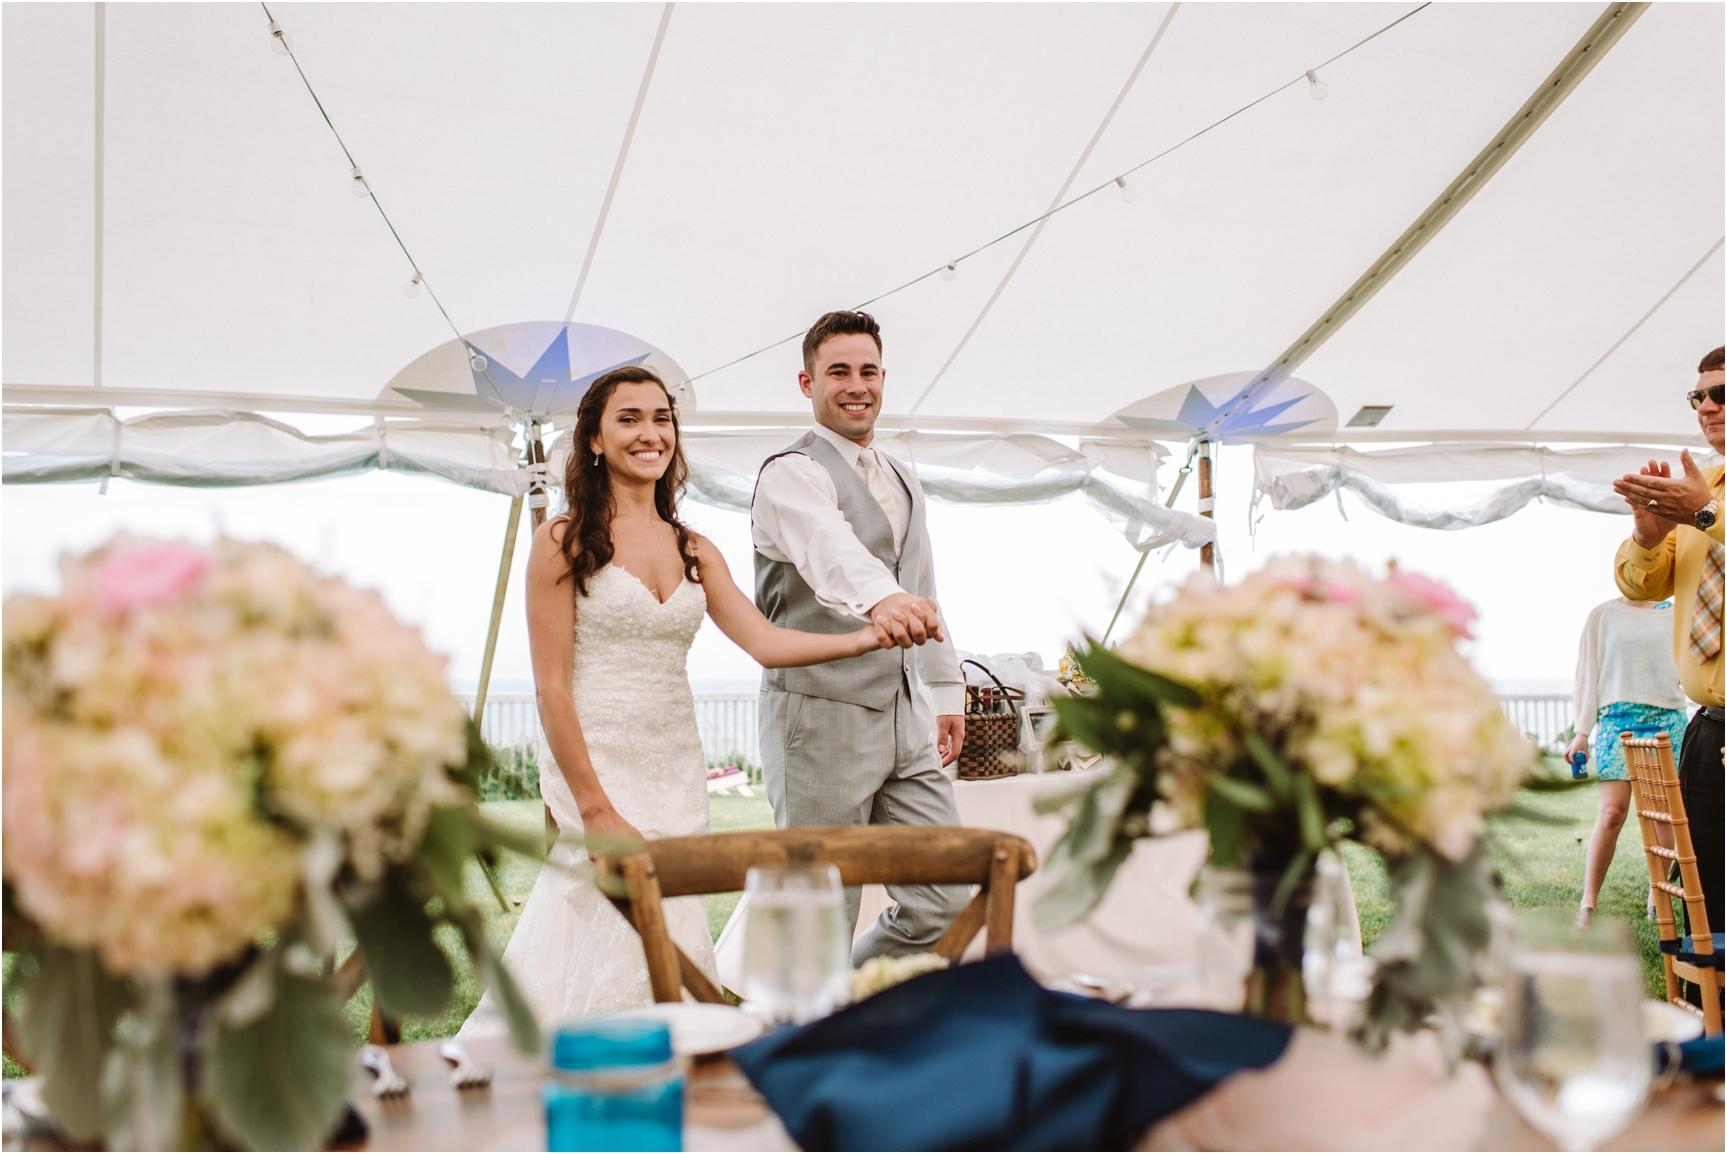 Sarah & Sam Pelham House Cape Cod Wedding Photographer-144.jpg